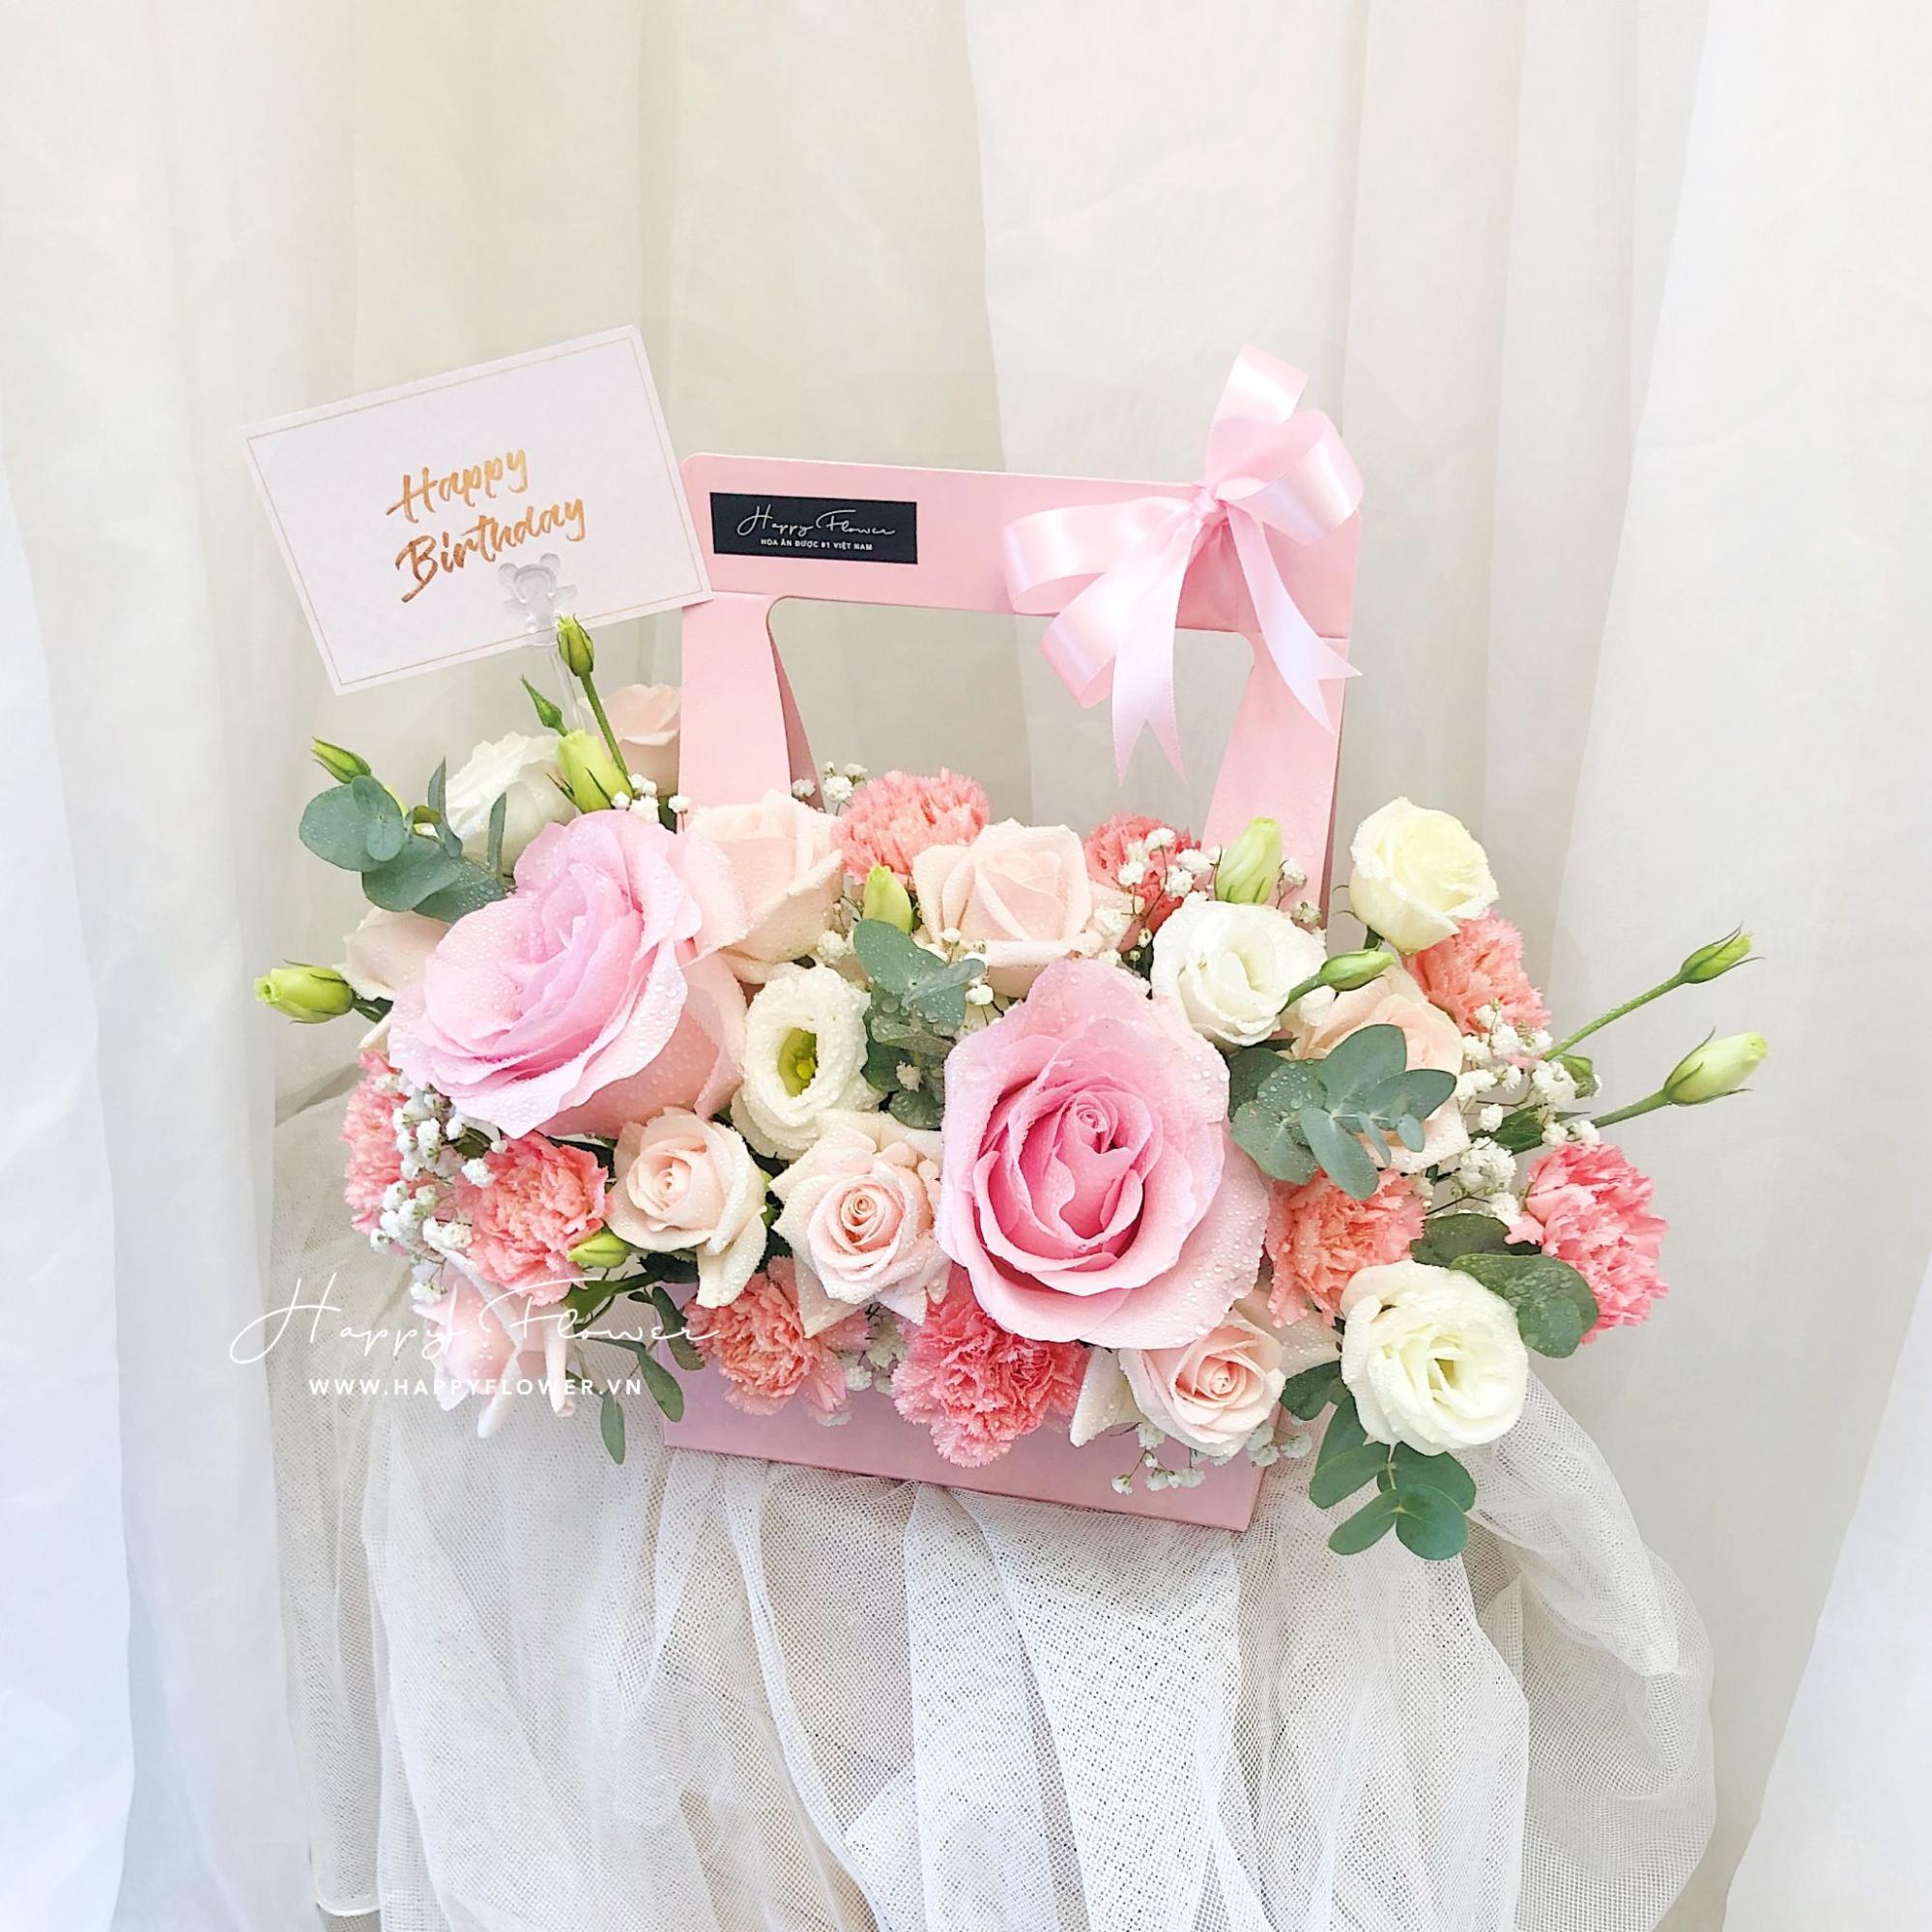 Hoa hồng cực đẹp tặng sinh nhật